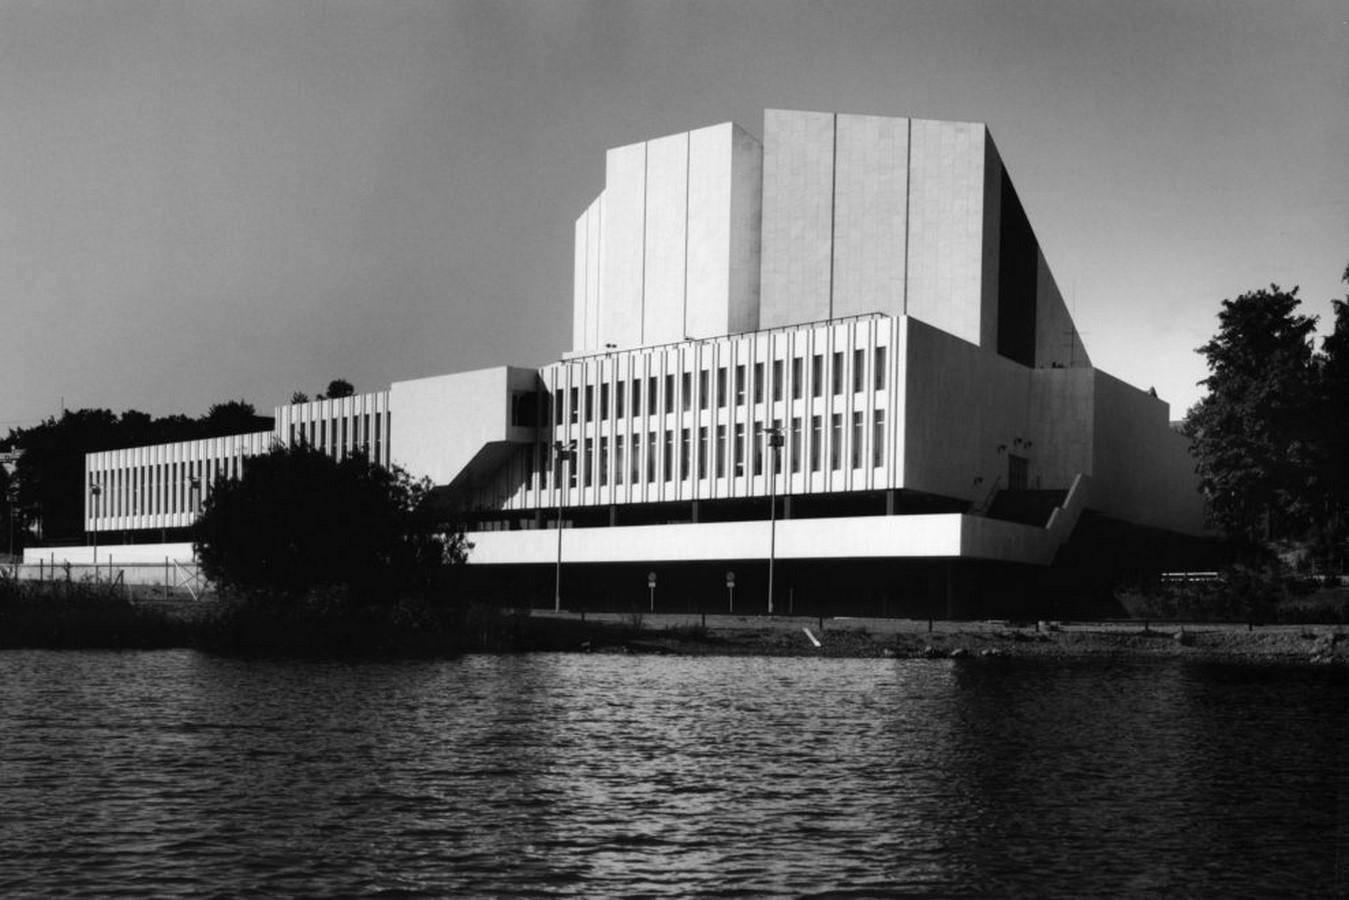 Finlandia Hall by Alvar Aalto: Celebrating Light and Nature - Sheet1